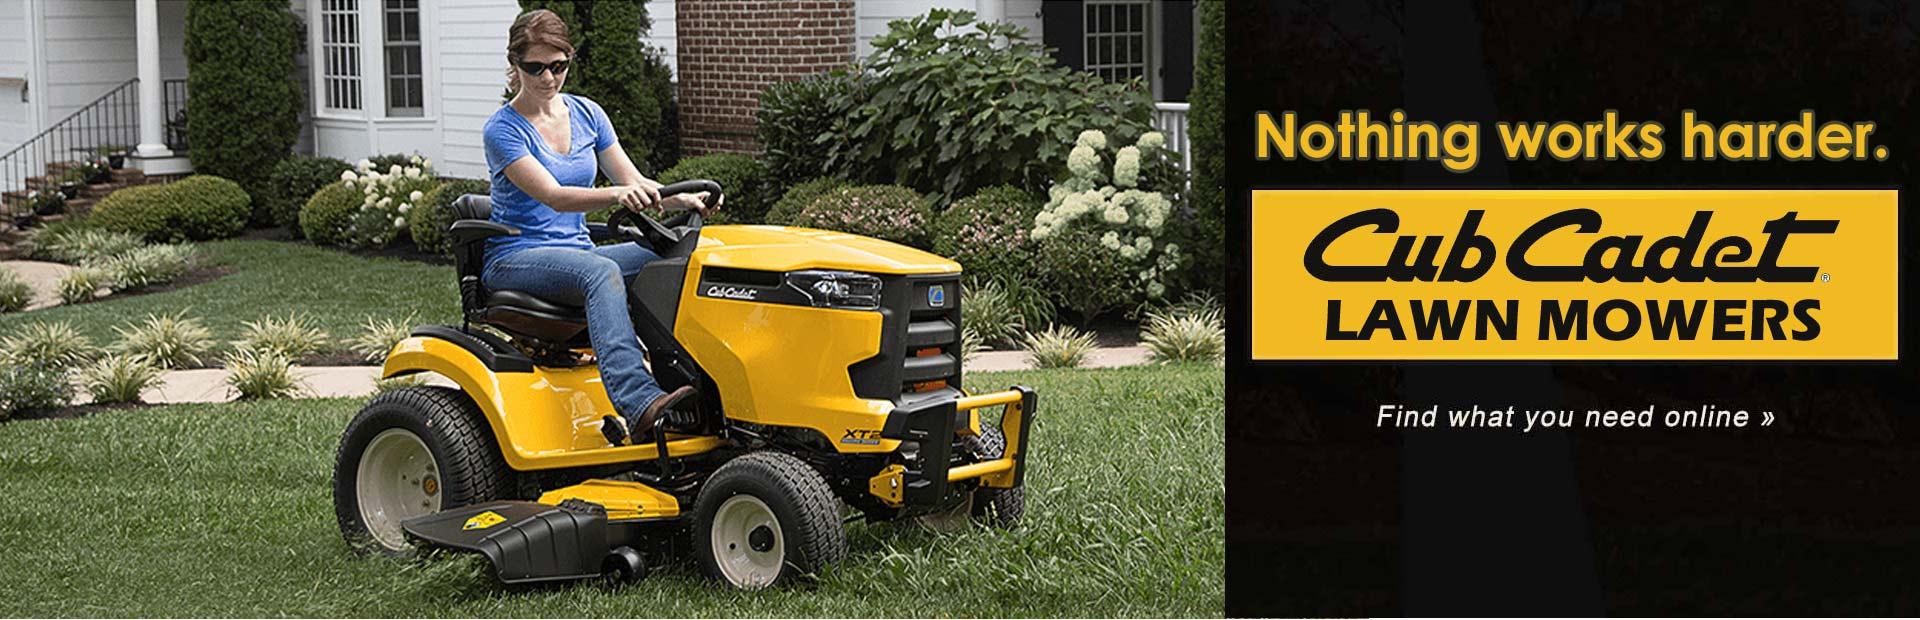 hight resolution of cub cadet lawn mowers